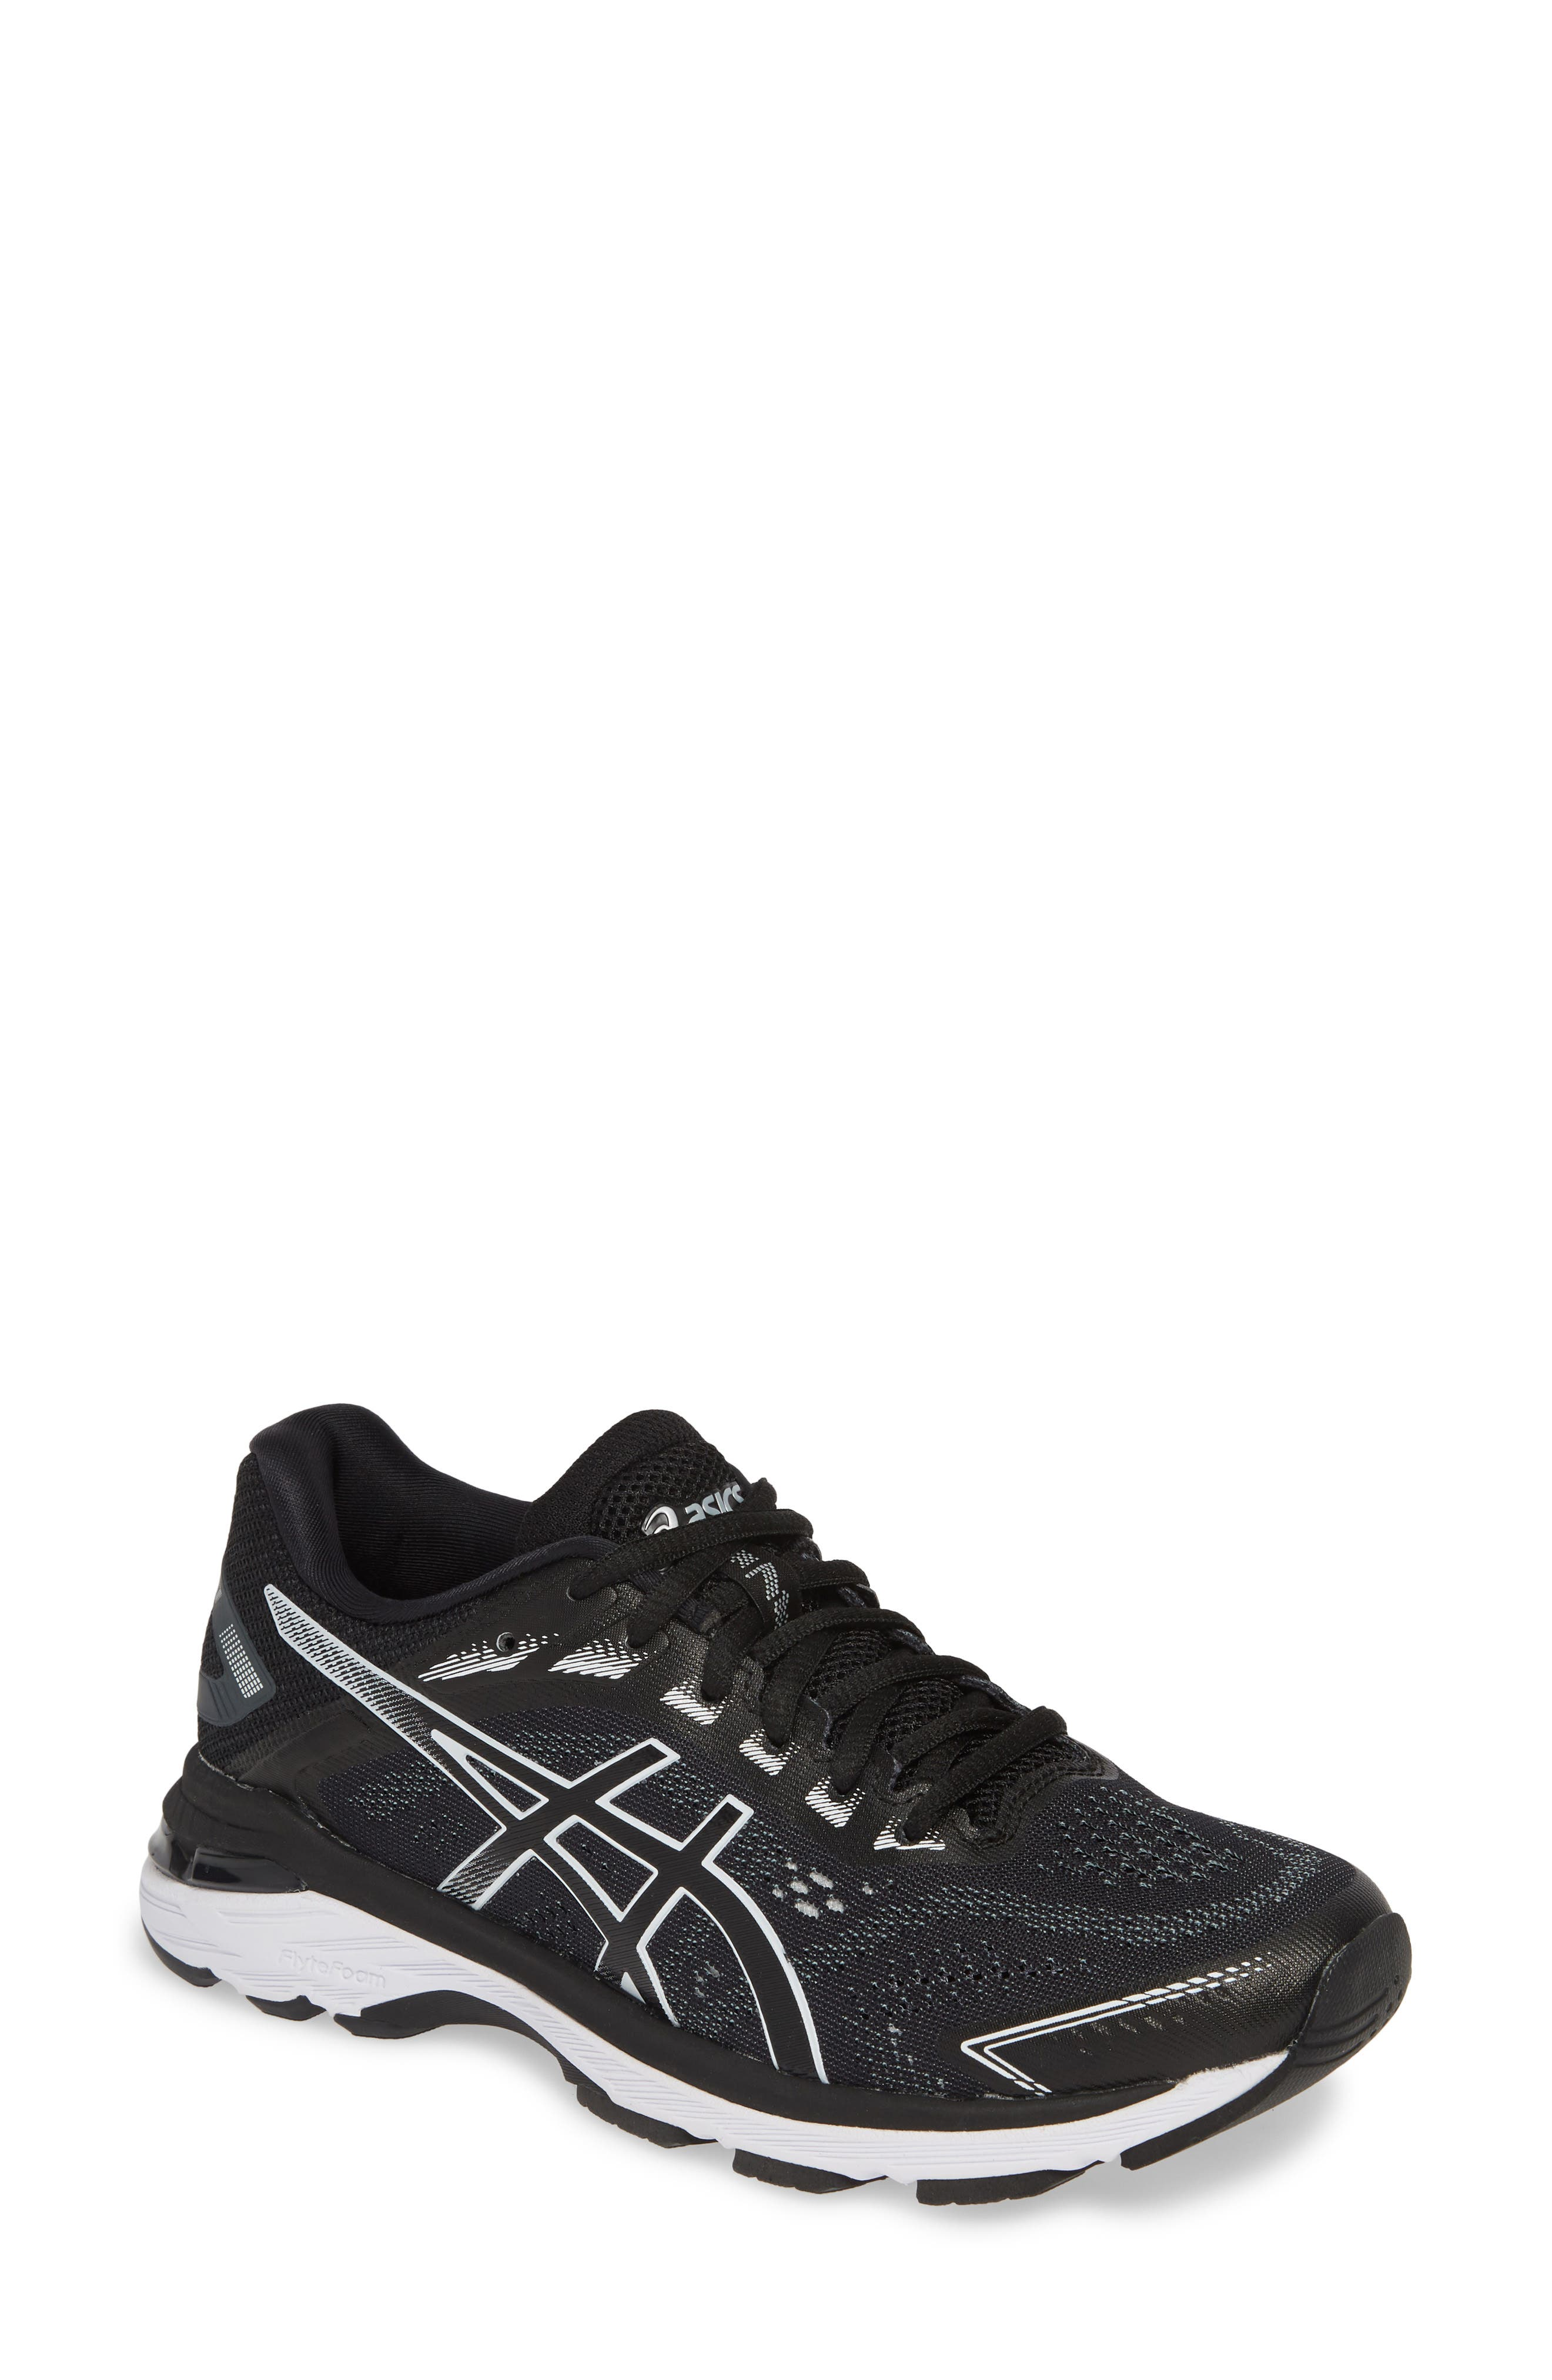 Asics Gt-2000 7 Running Shoe B - Black